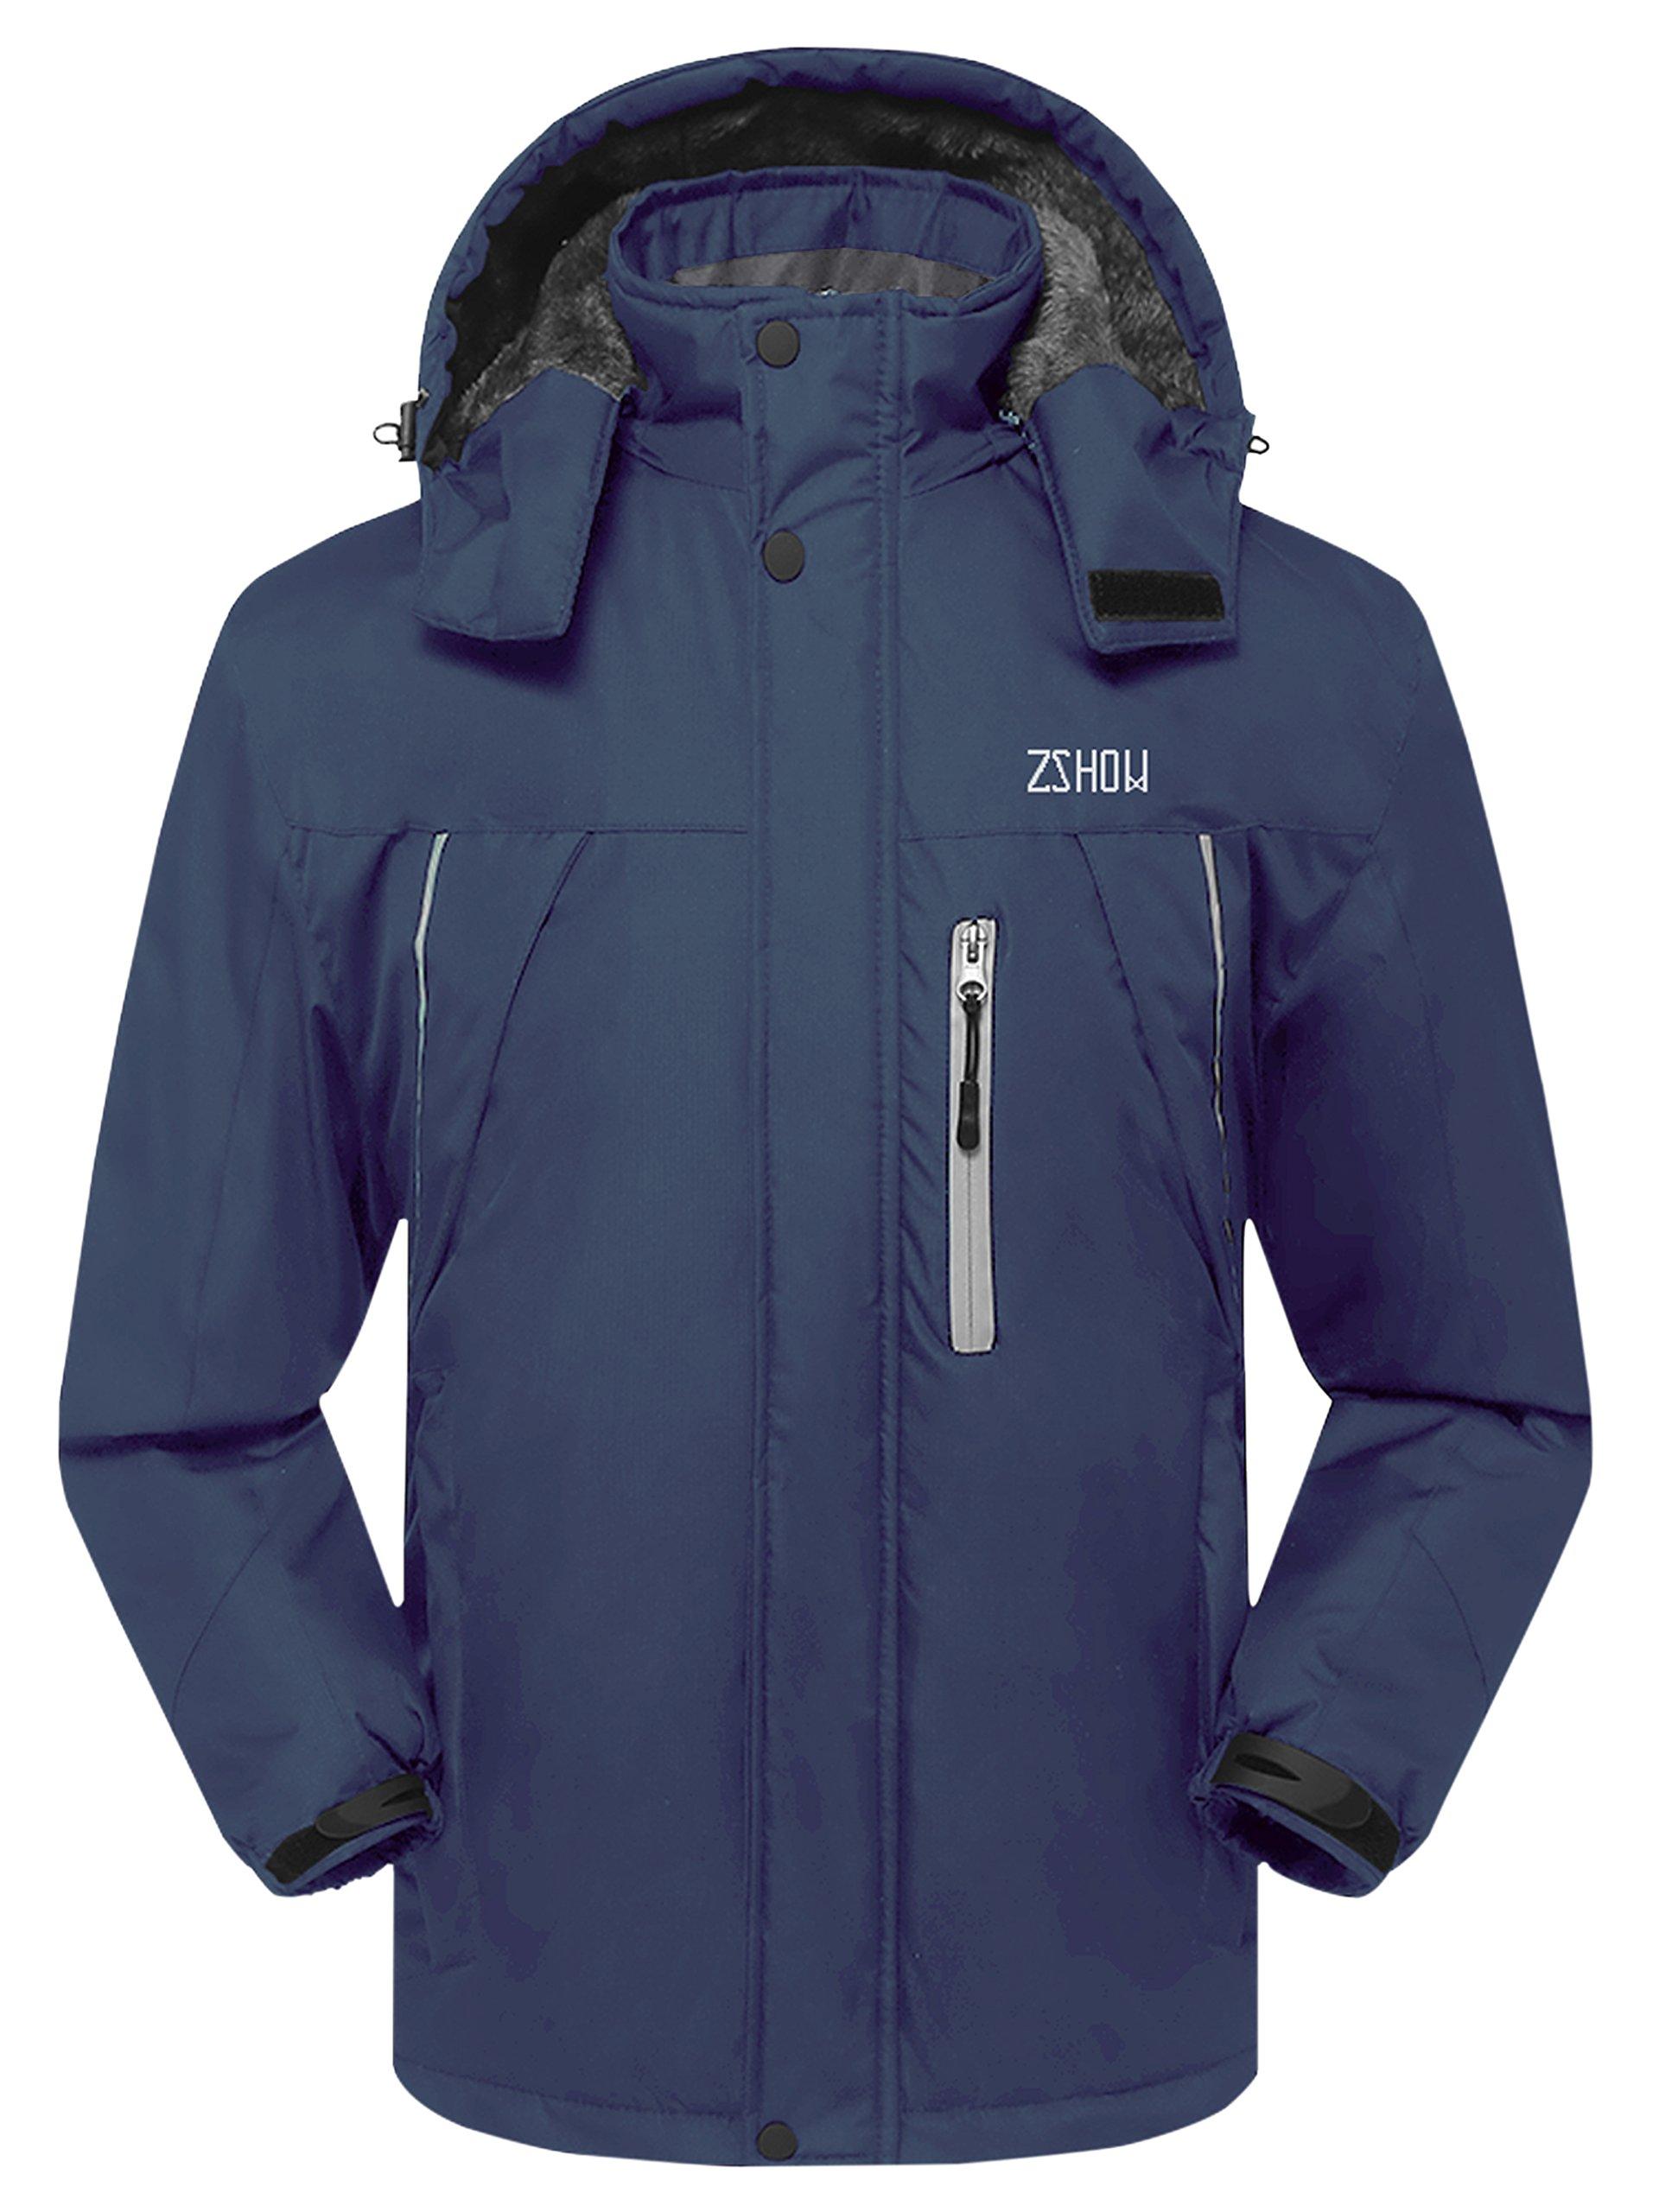 ZSHOW Men s Waterproof Ski Jacket Windproof Fleece Outdoor Insulated  Mountain Snow Rain Jacket product image f4cedc41e